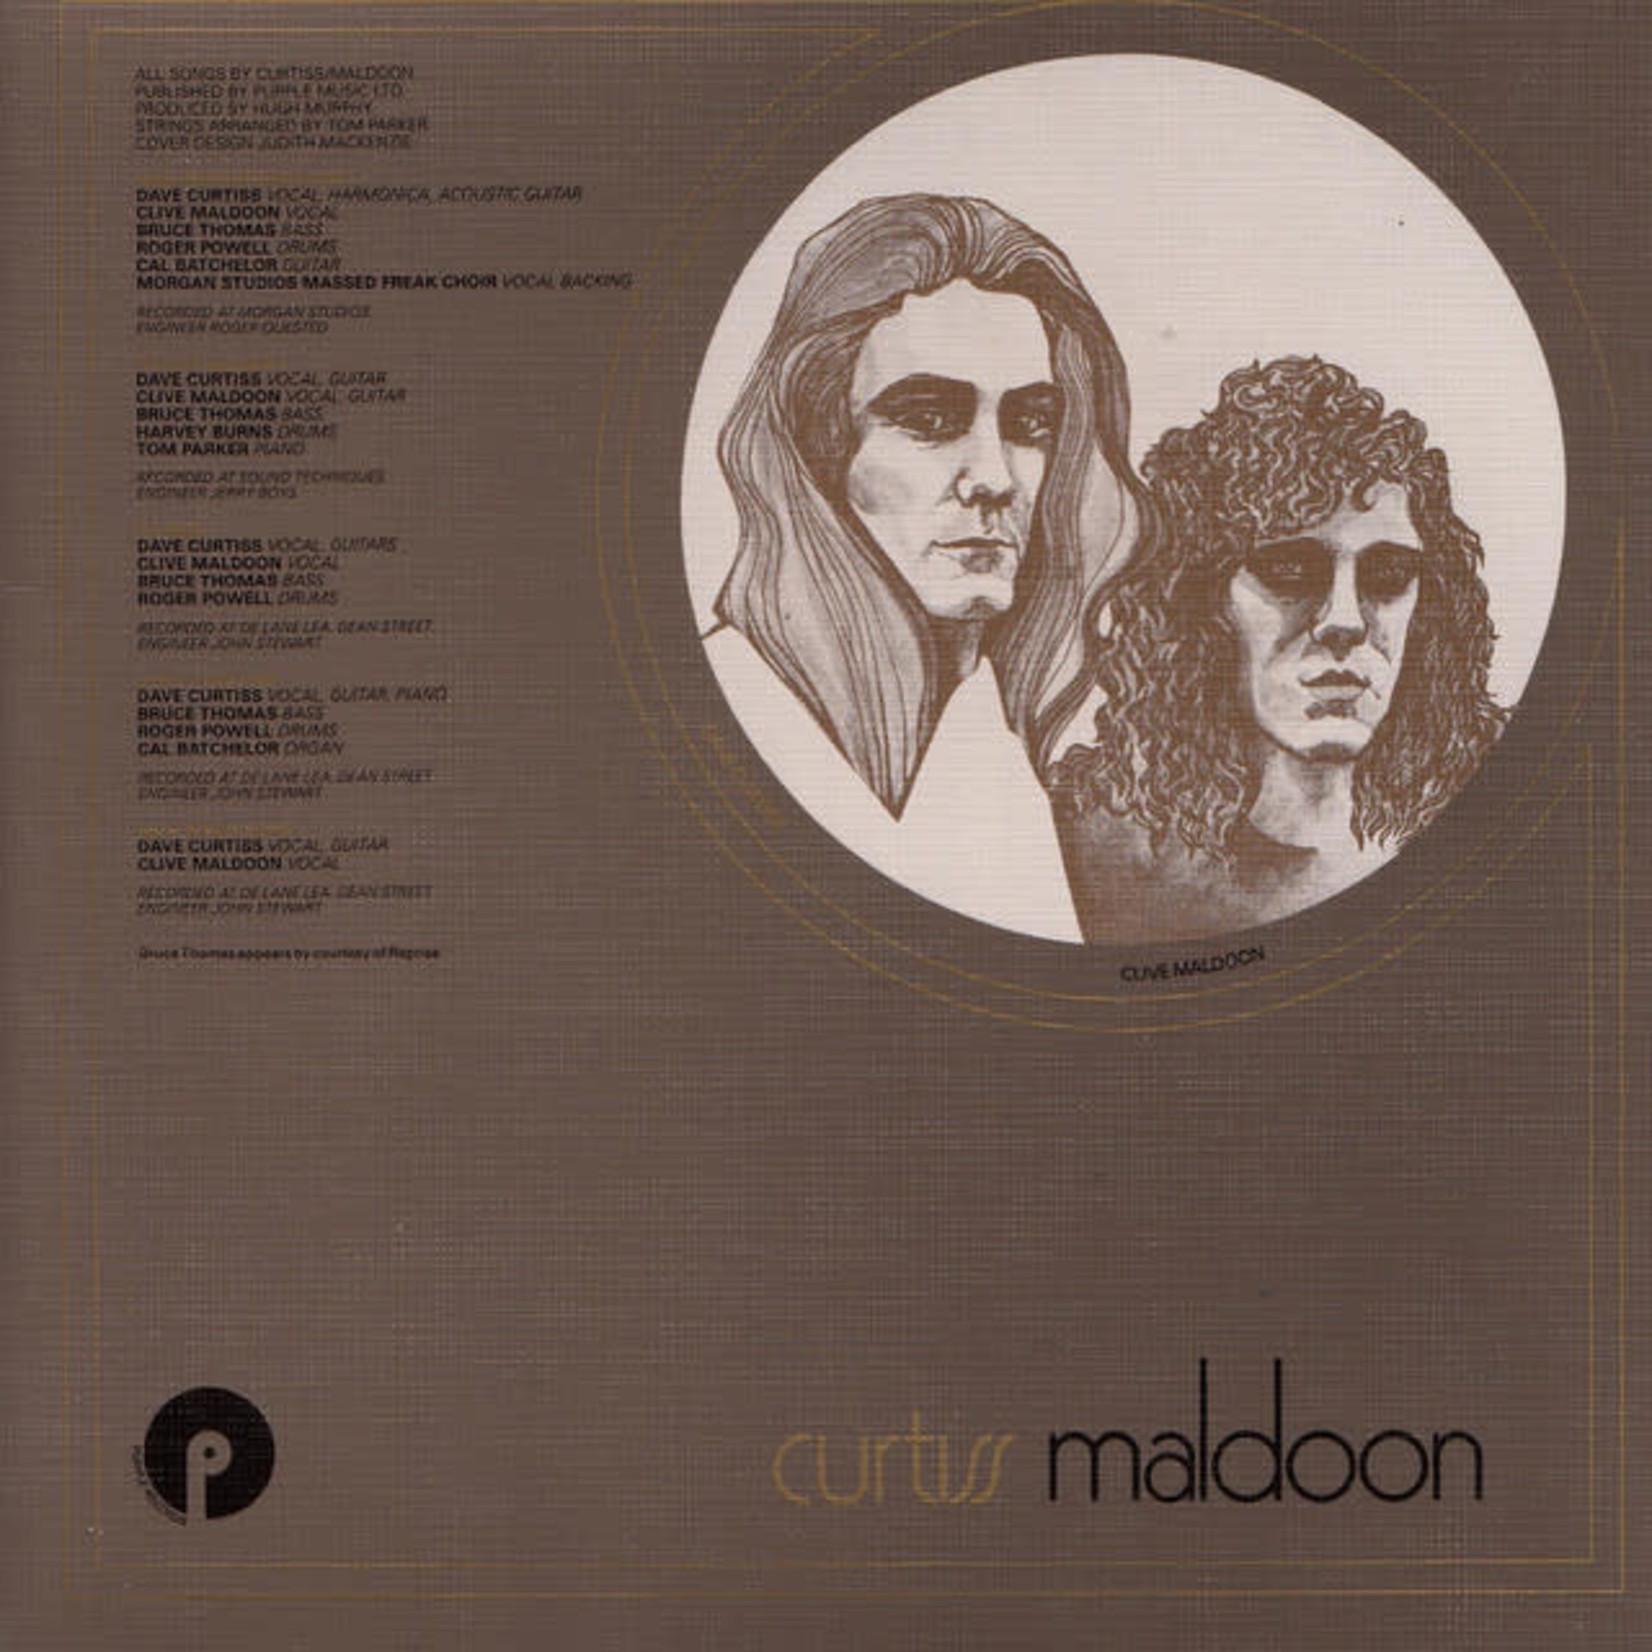 Vinyl Curtiss Maldoon - S/T